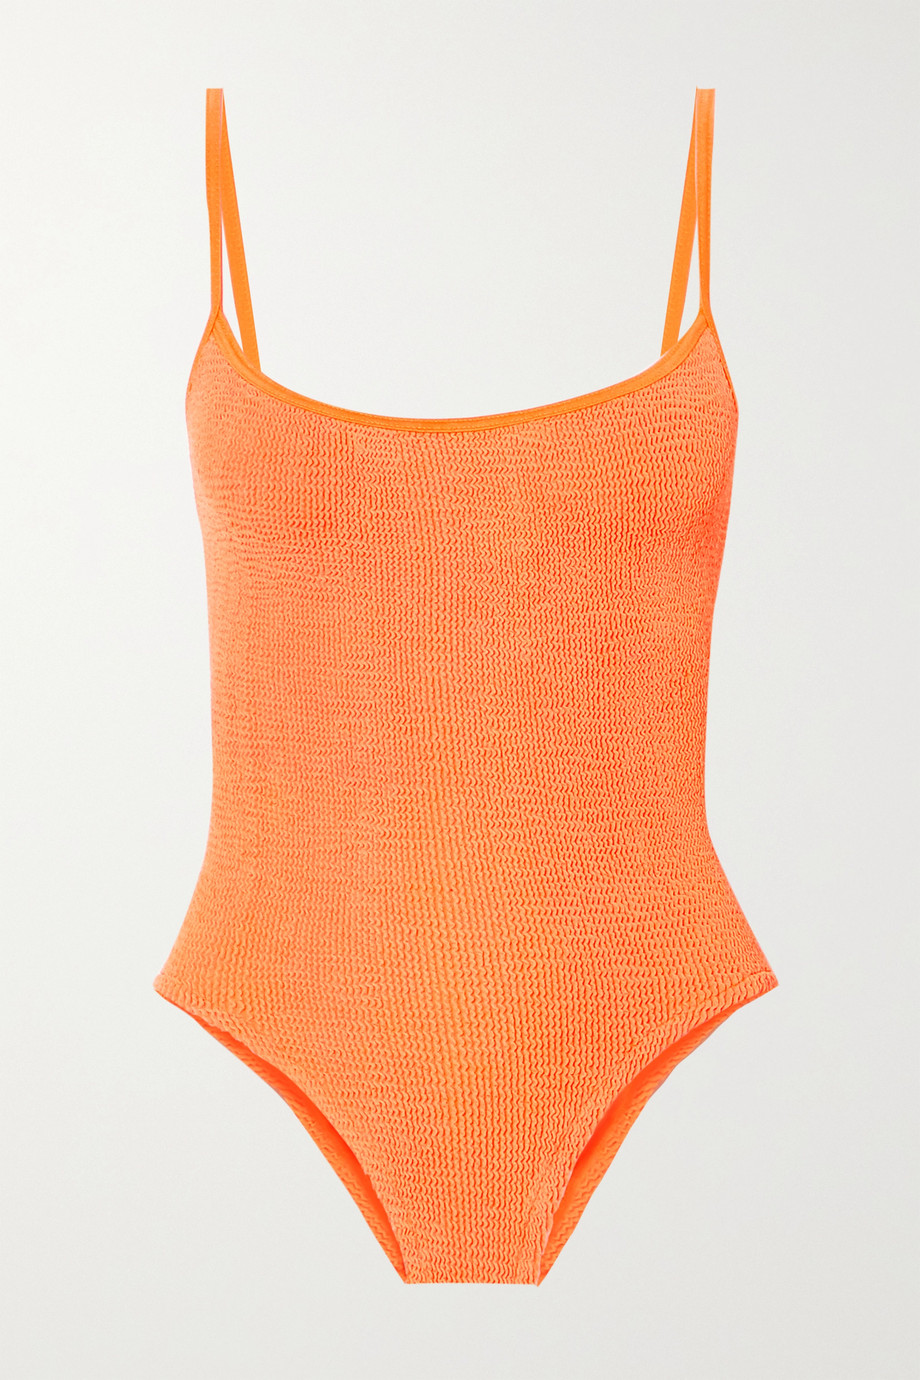 Hunza G + NET SUSTAIN Maria seersucker swimsuit